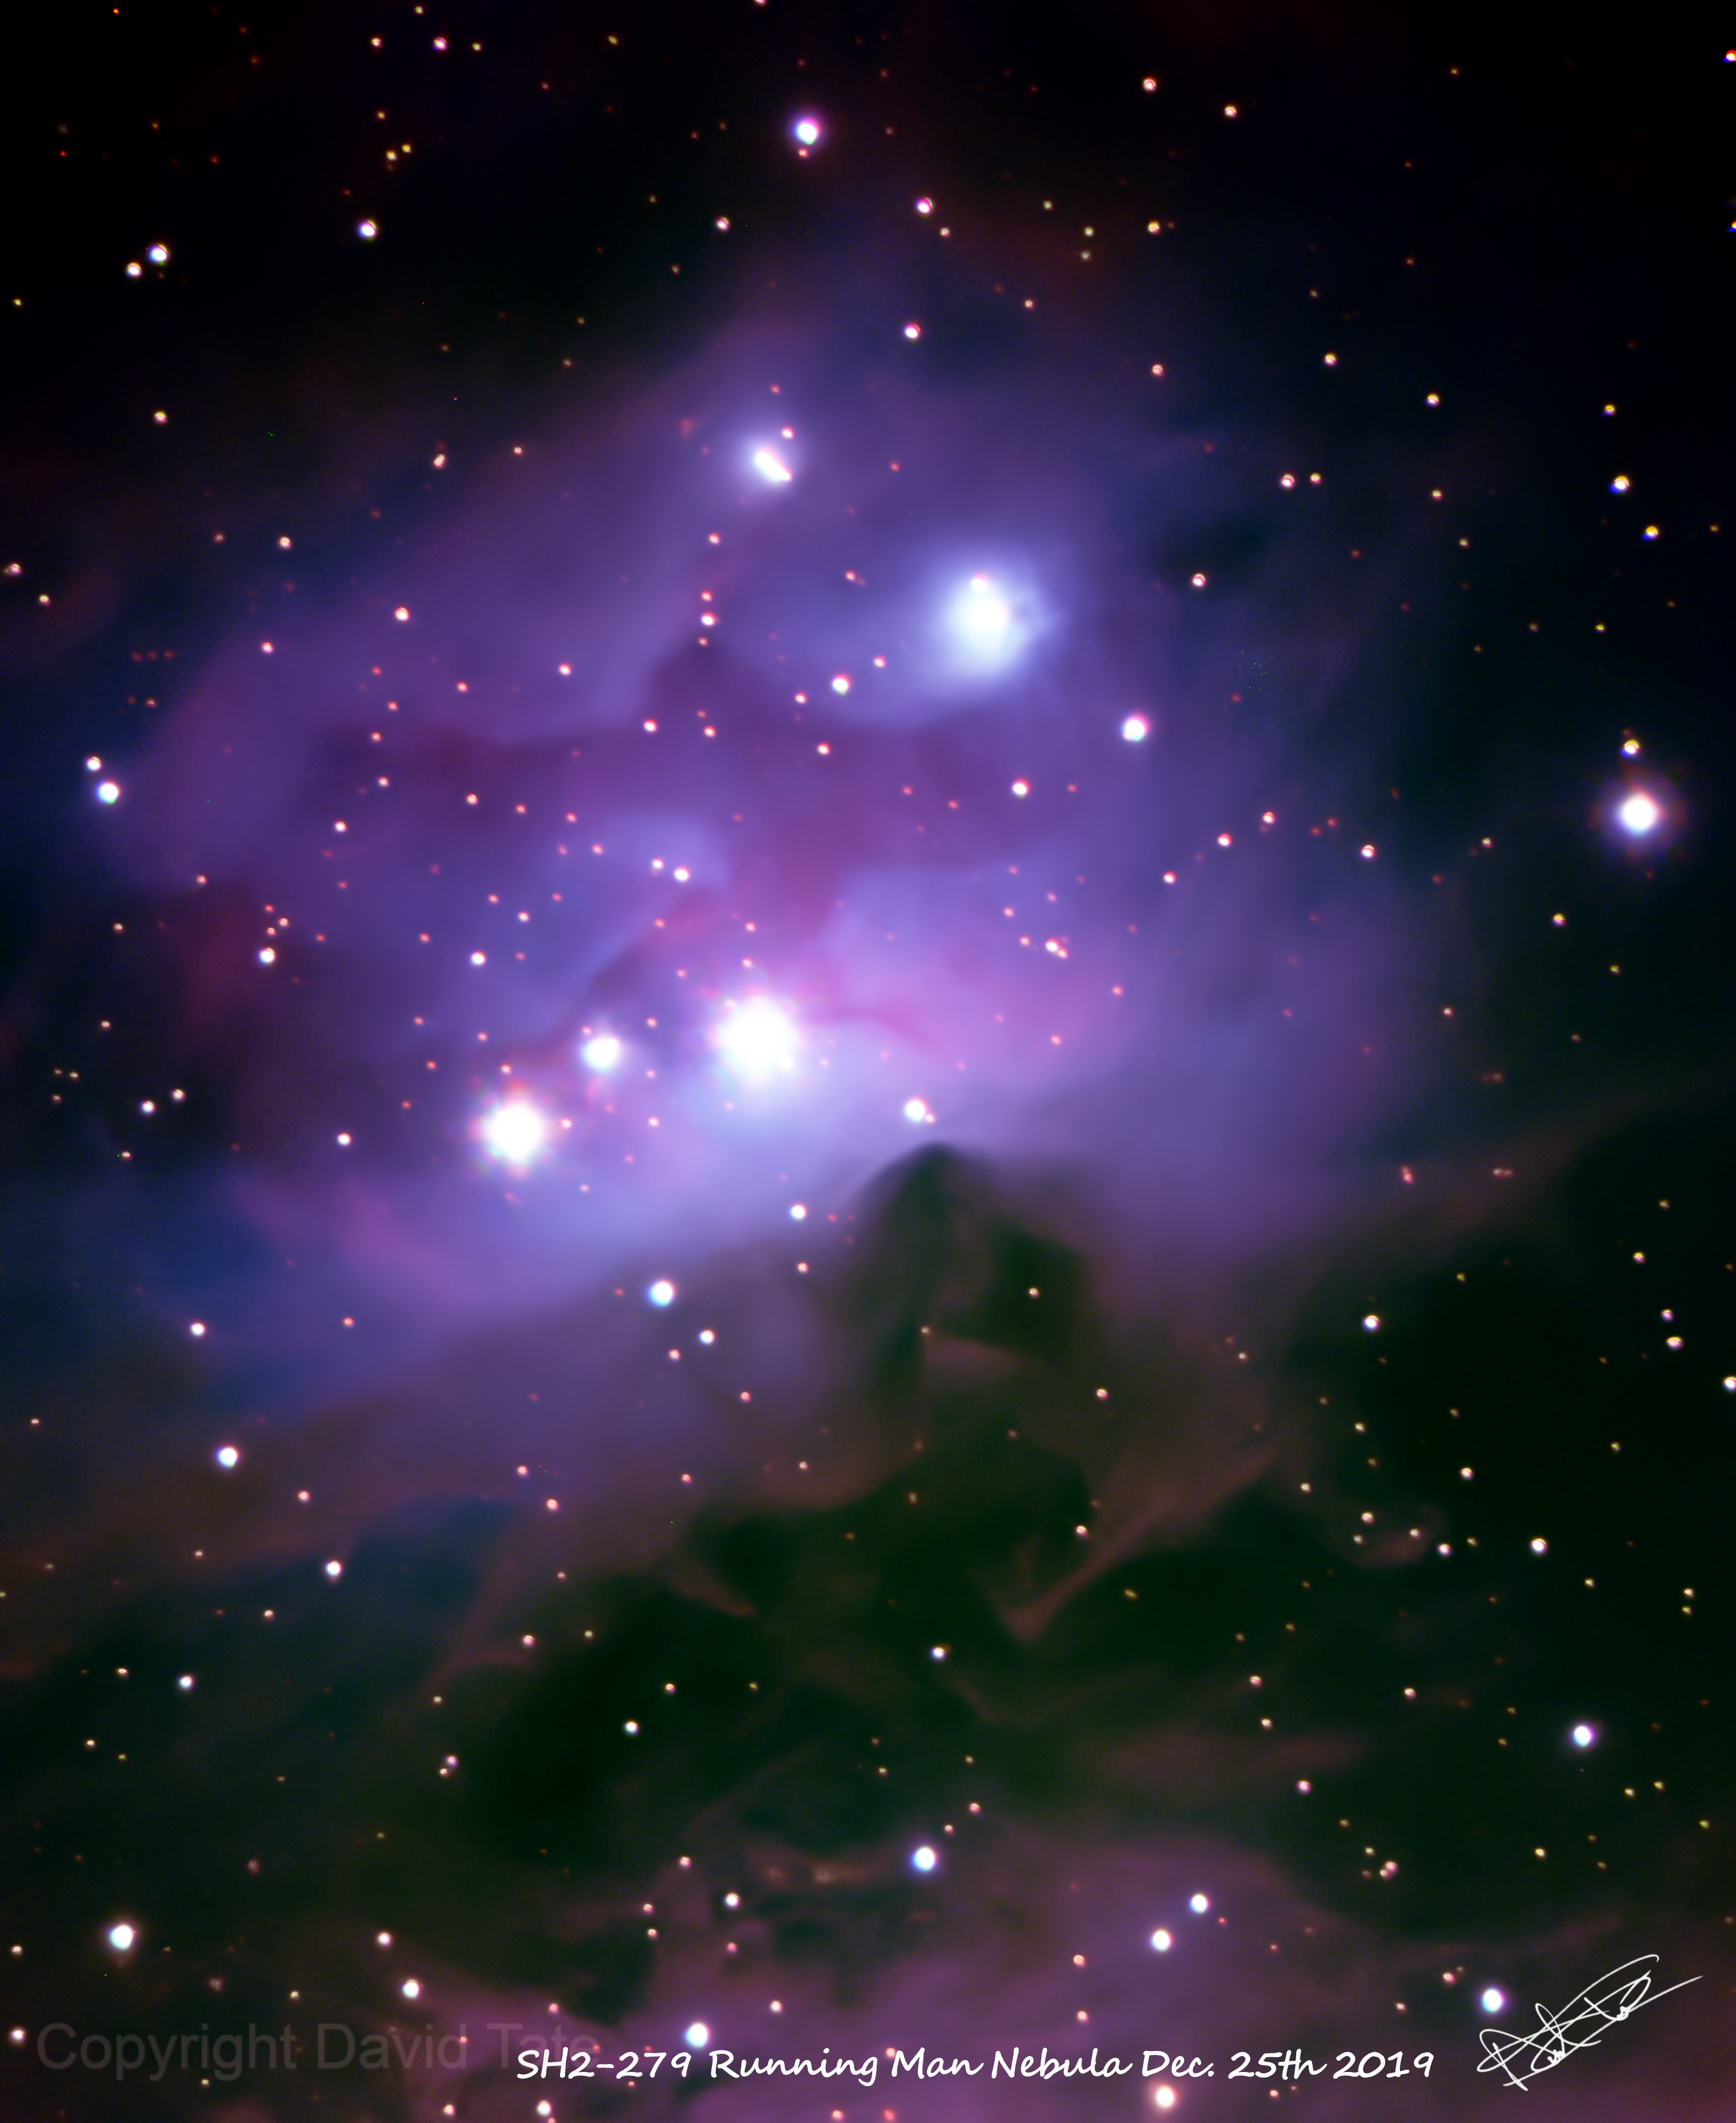 SH2-279 Running Man Nebula,                                David Tate